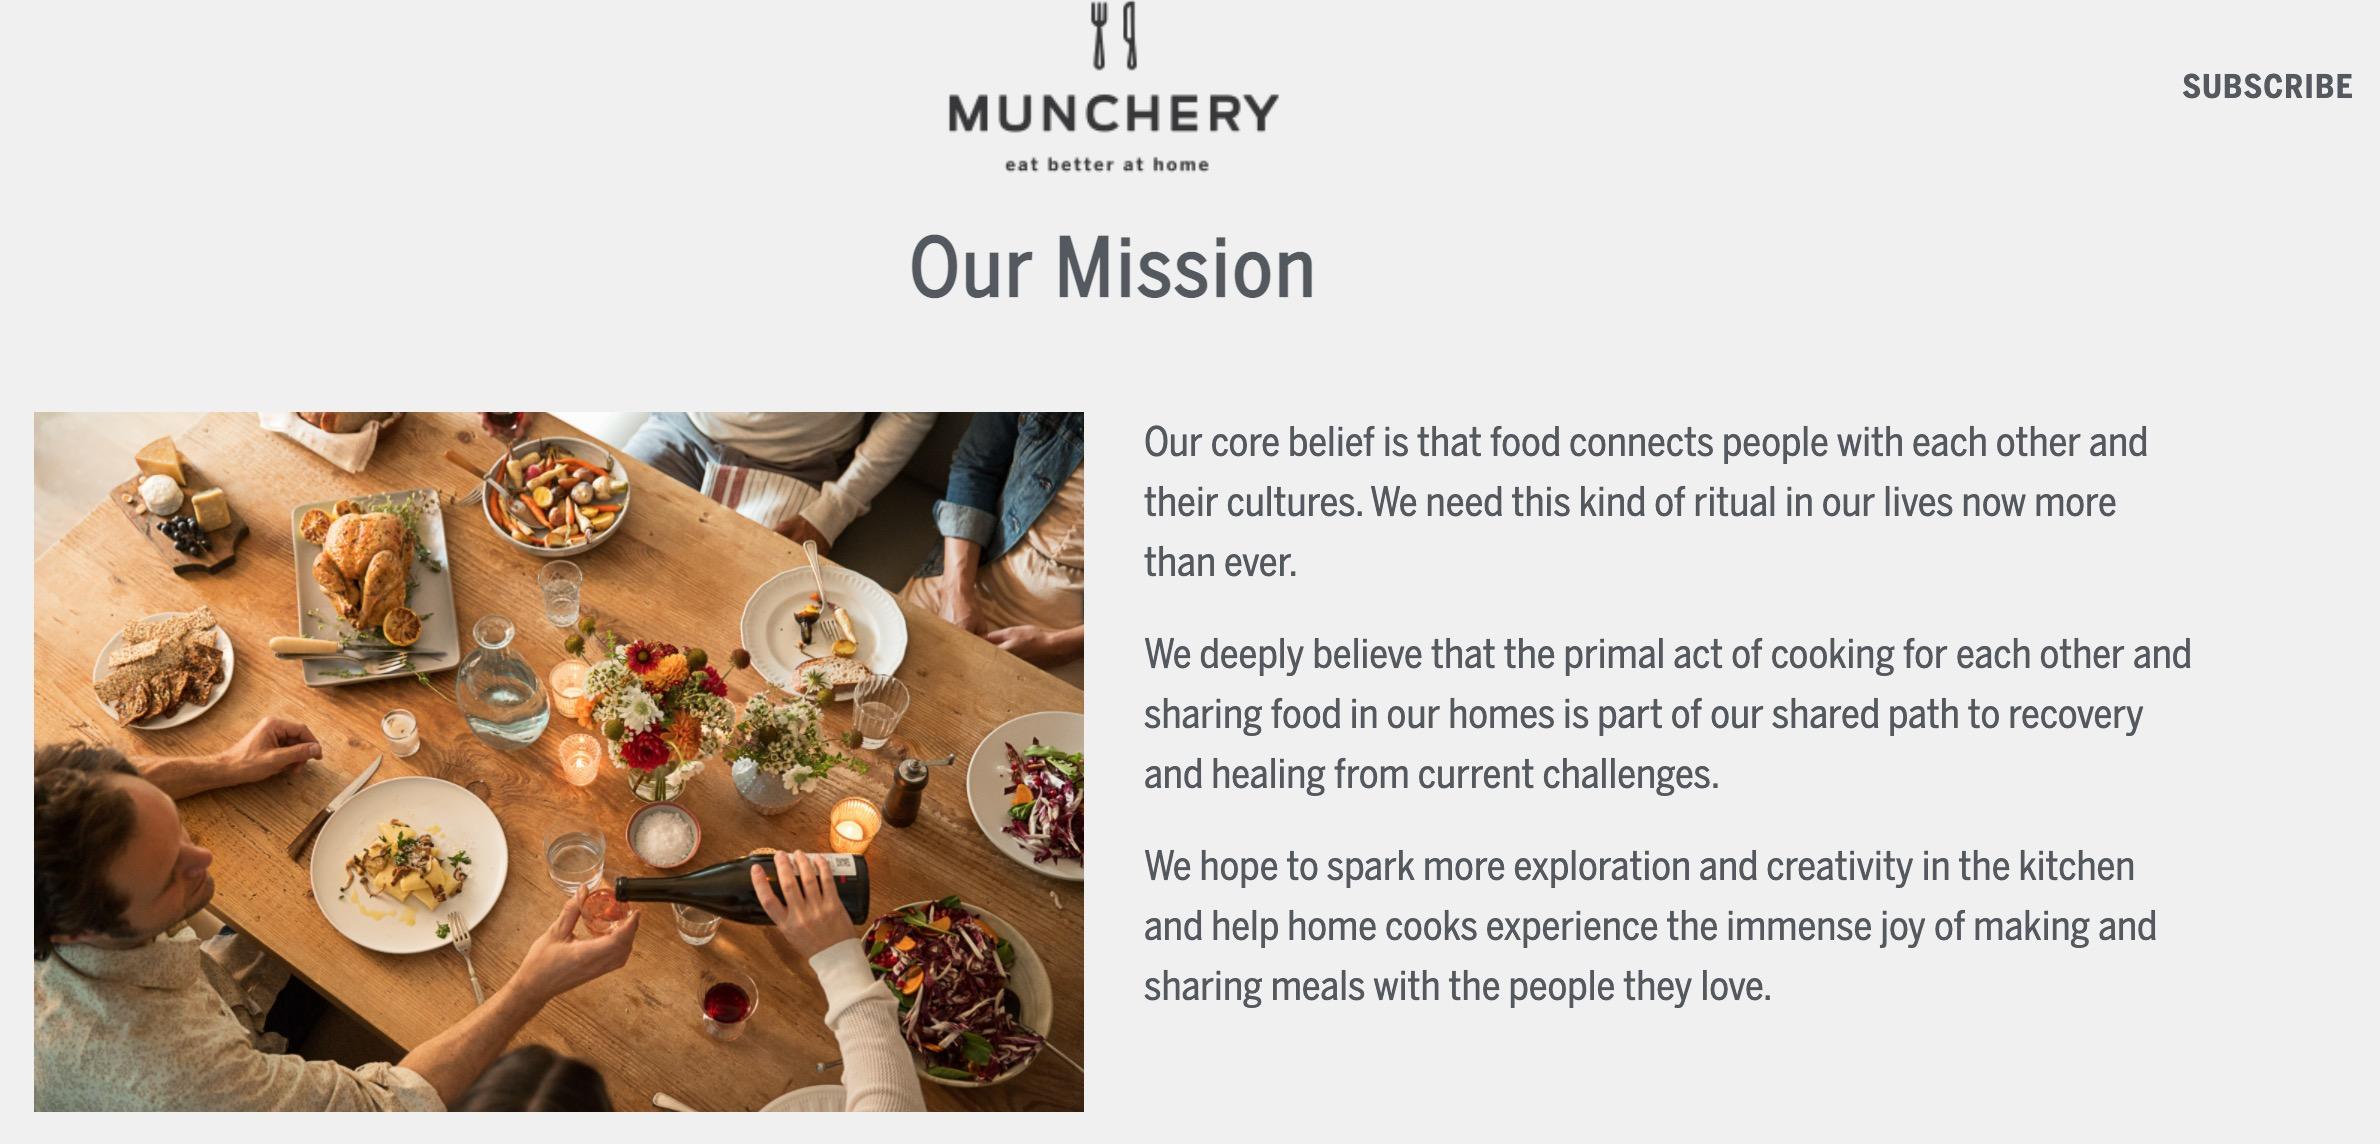 munchery mission